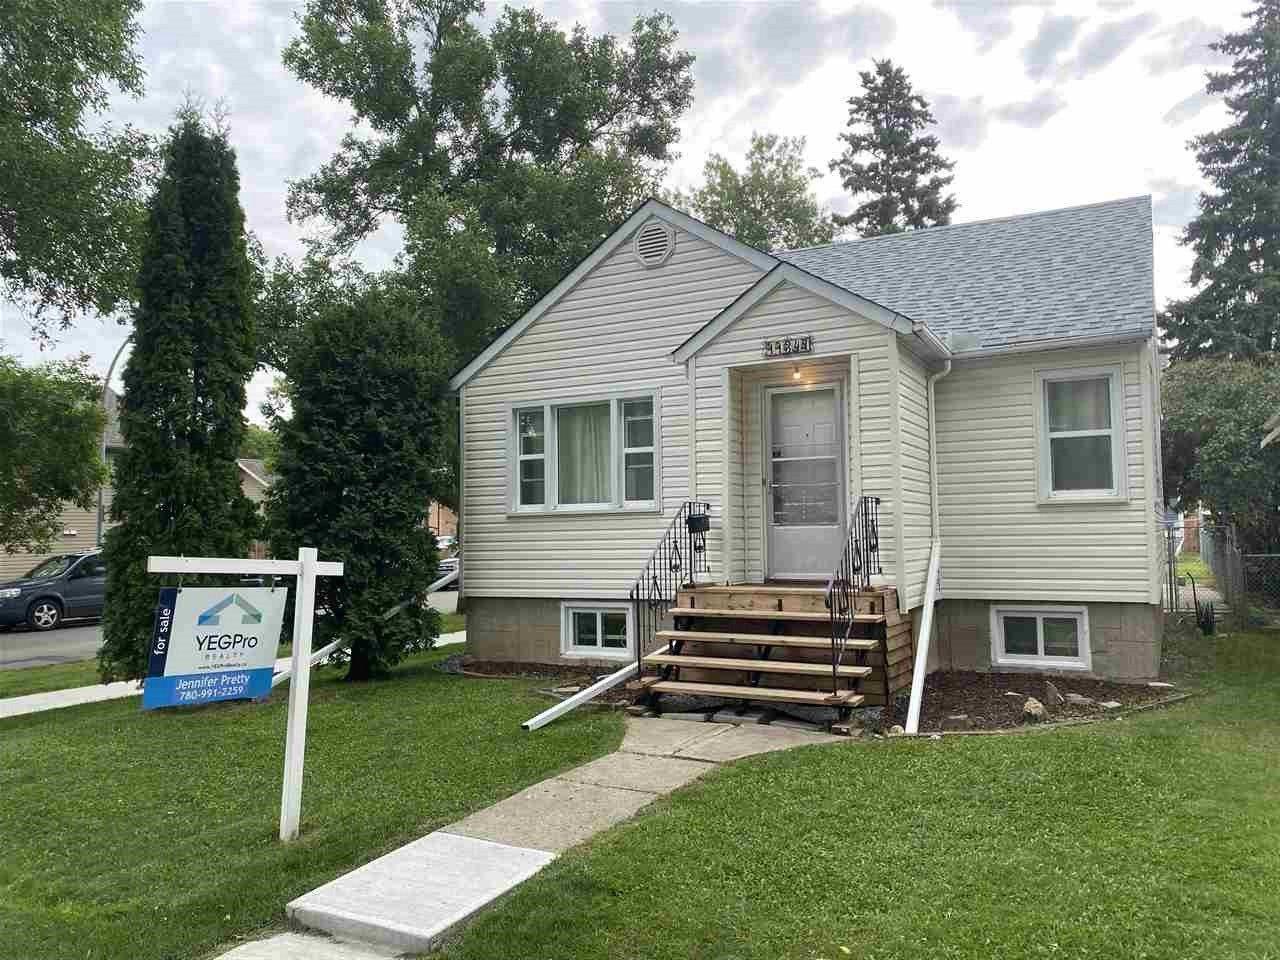 Main Photo: 11347 92 Street in Edmonton: Zone 05 House for sale : MLS®# E4196431